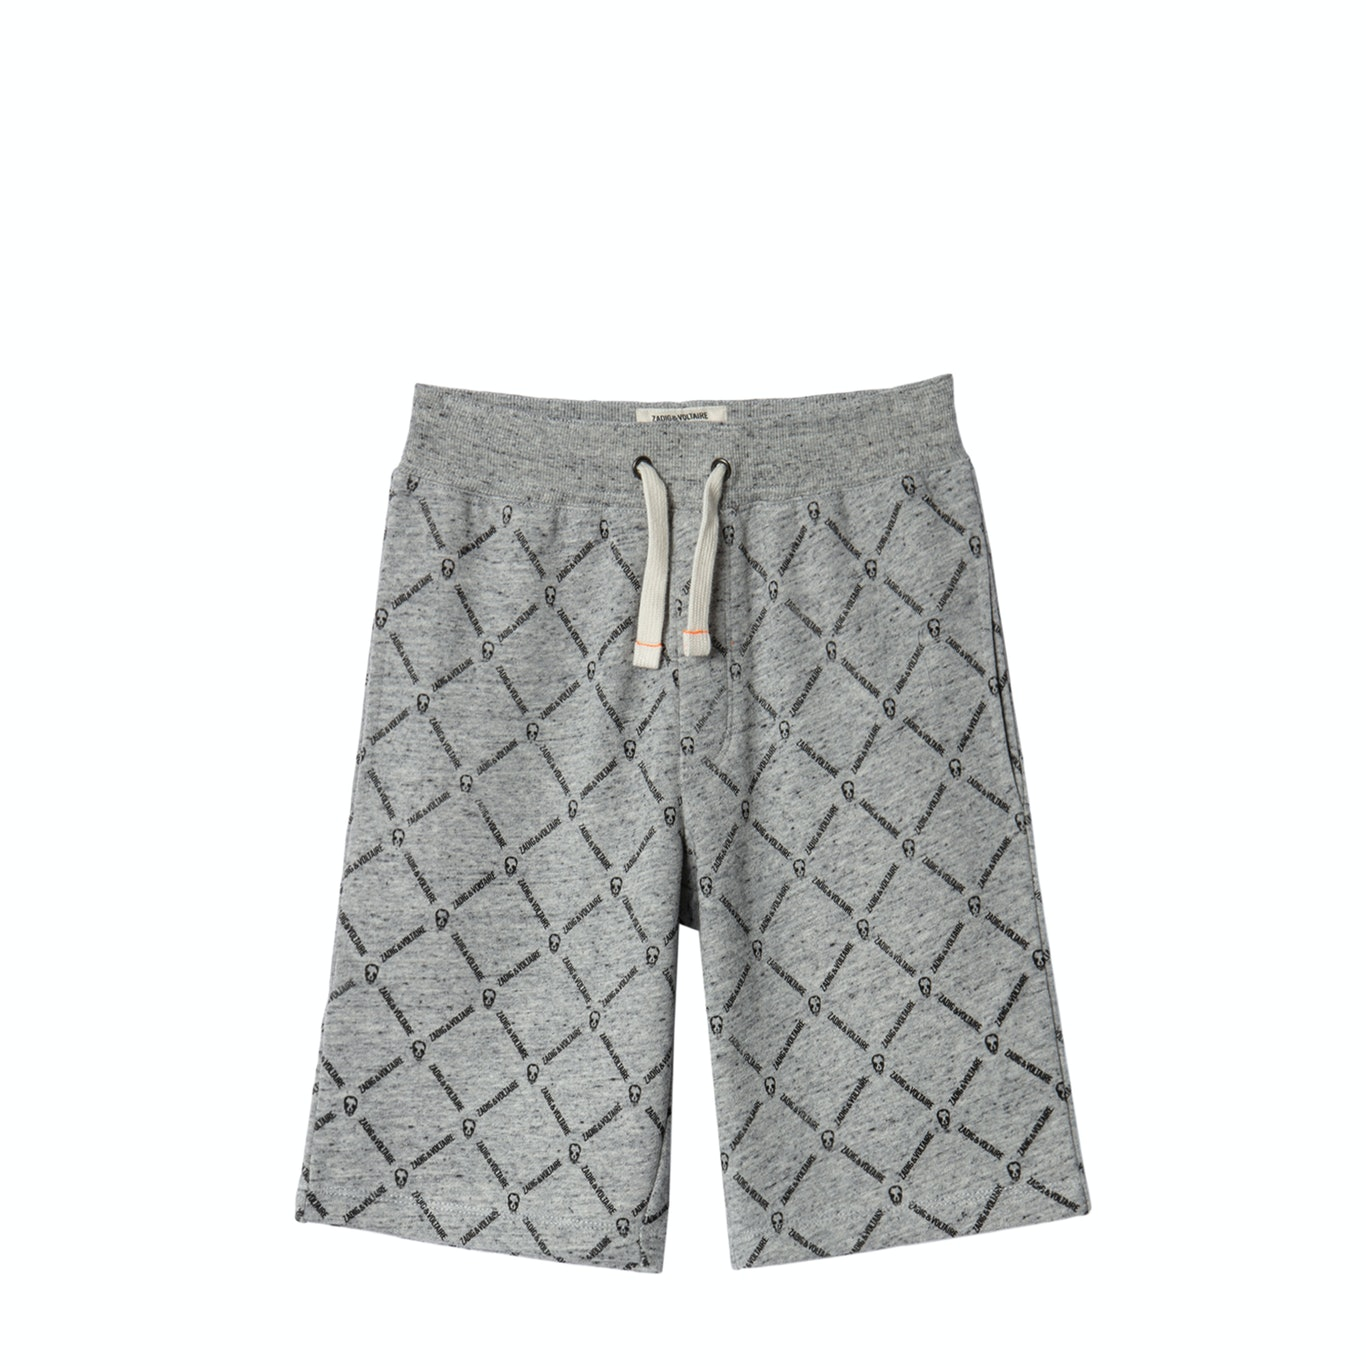 Child's Kurt shorts